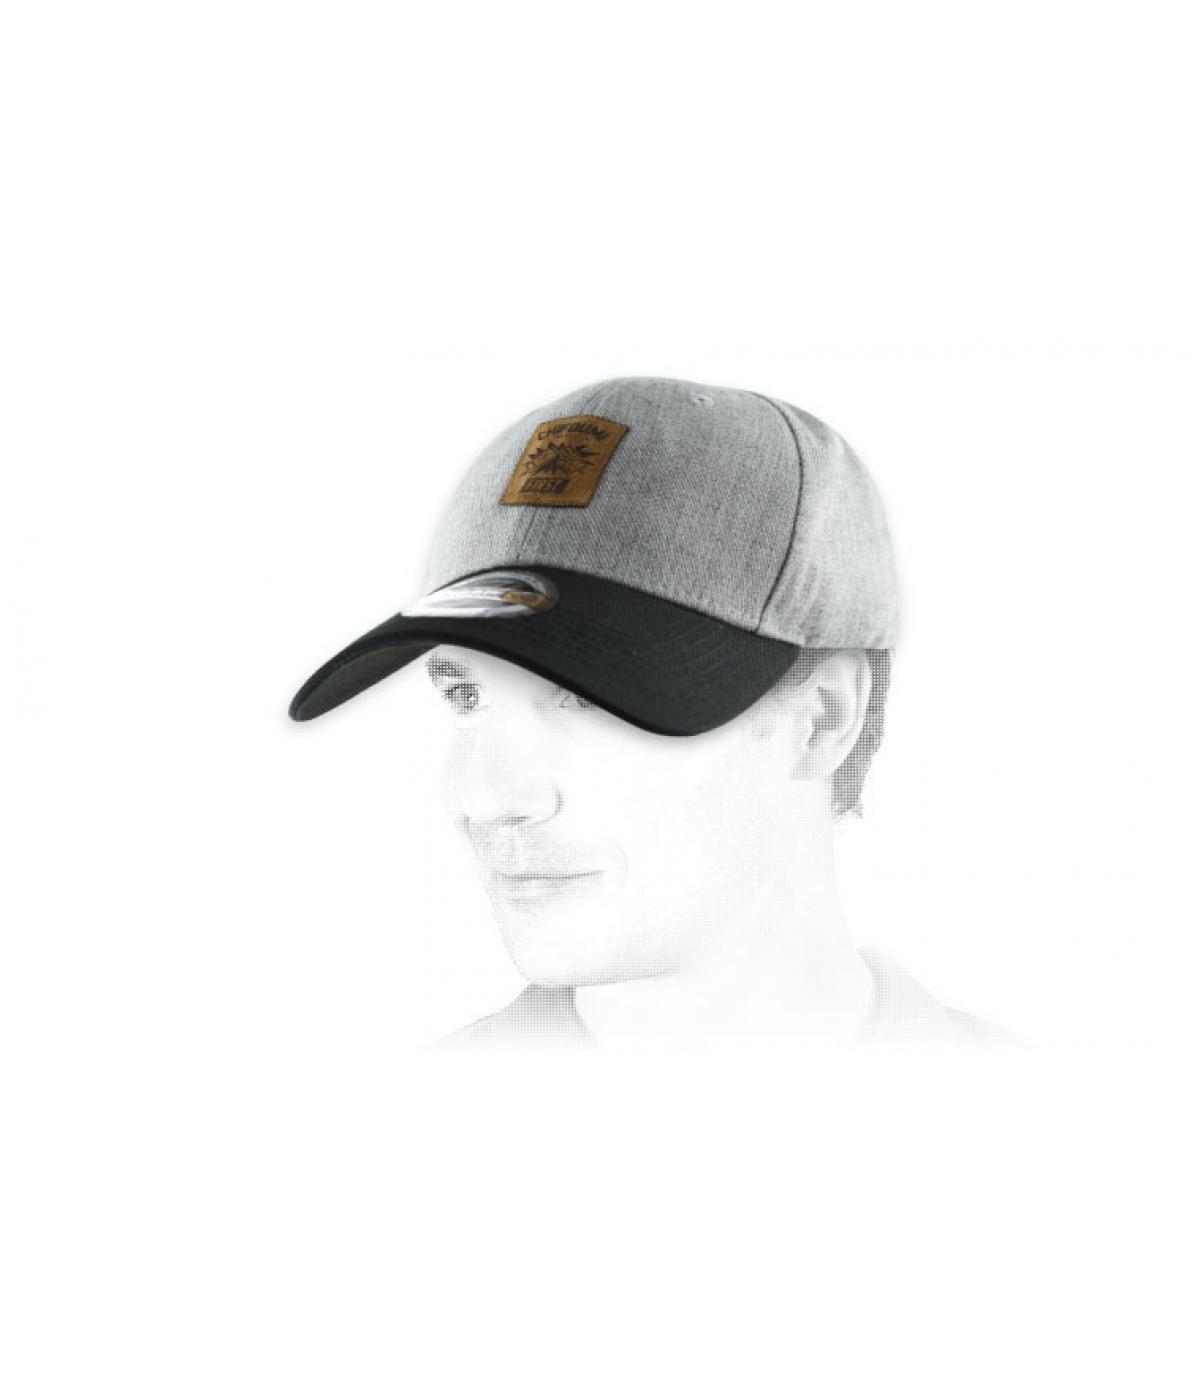 casquette Chifoumi grise